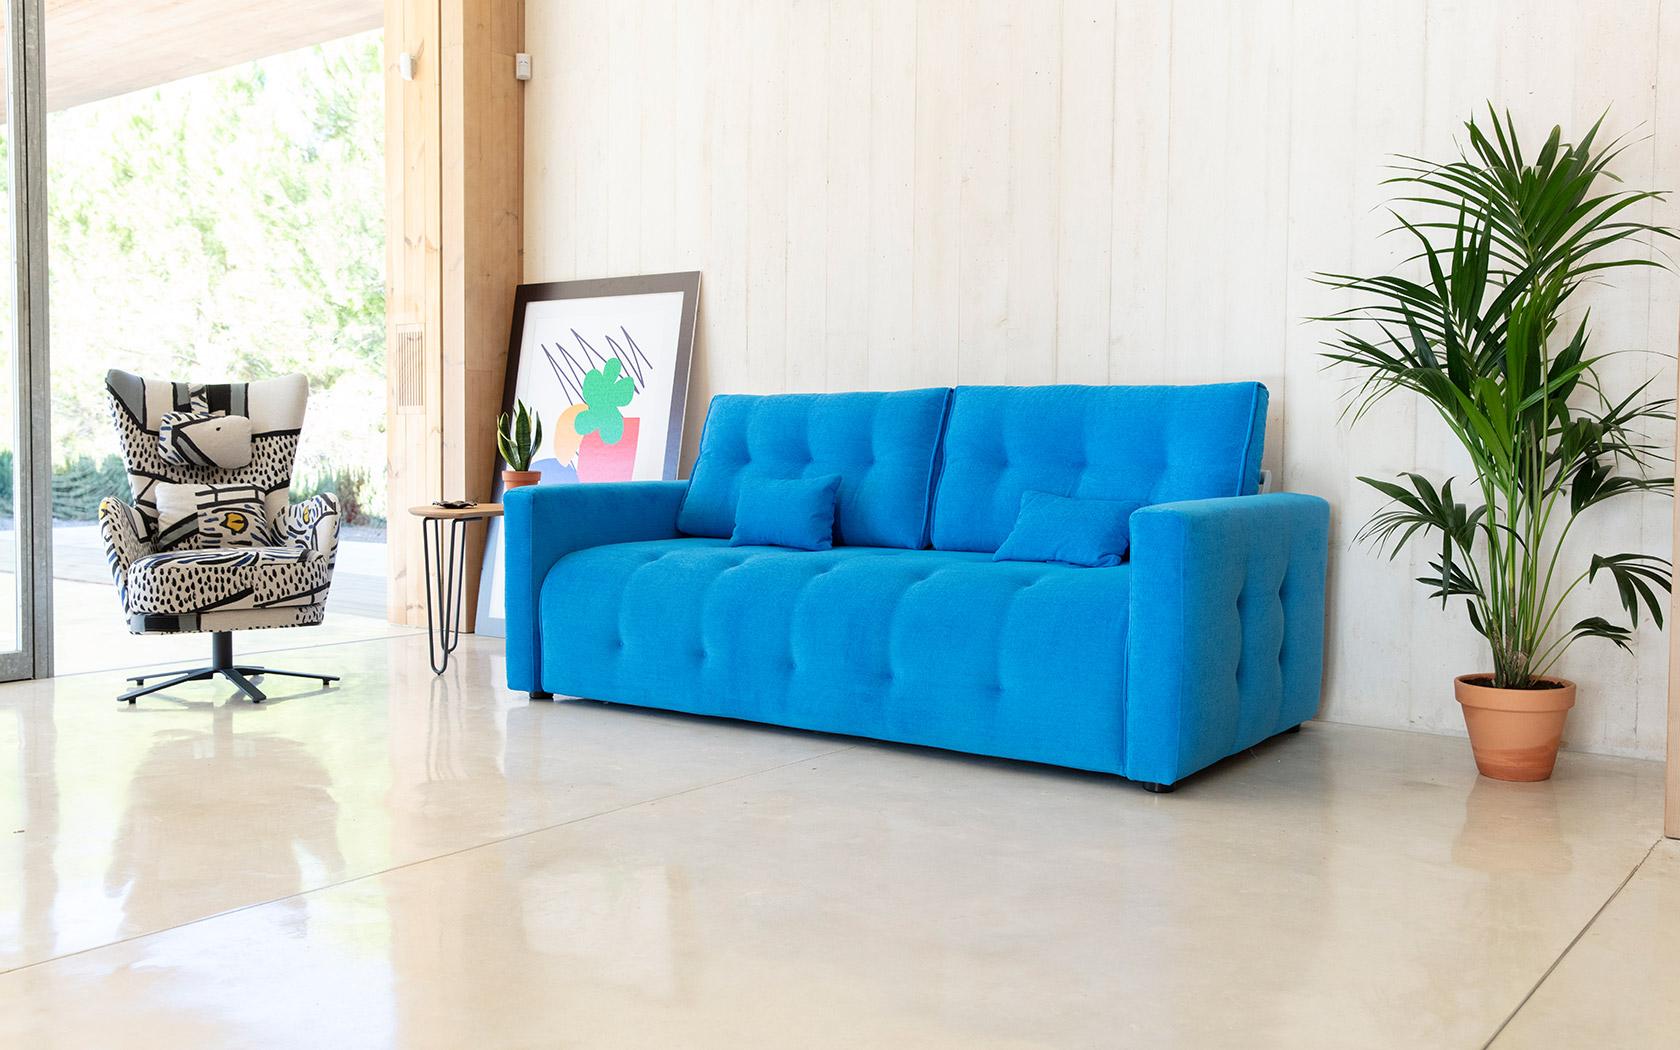 indy sofa 2021 baja 03